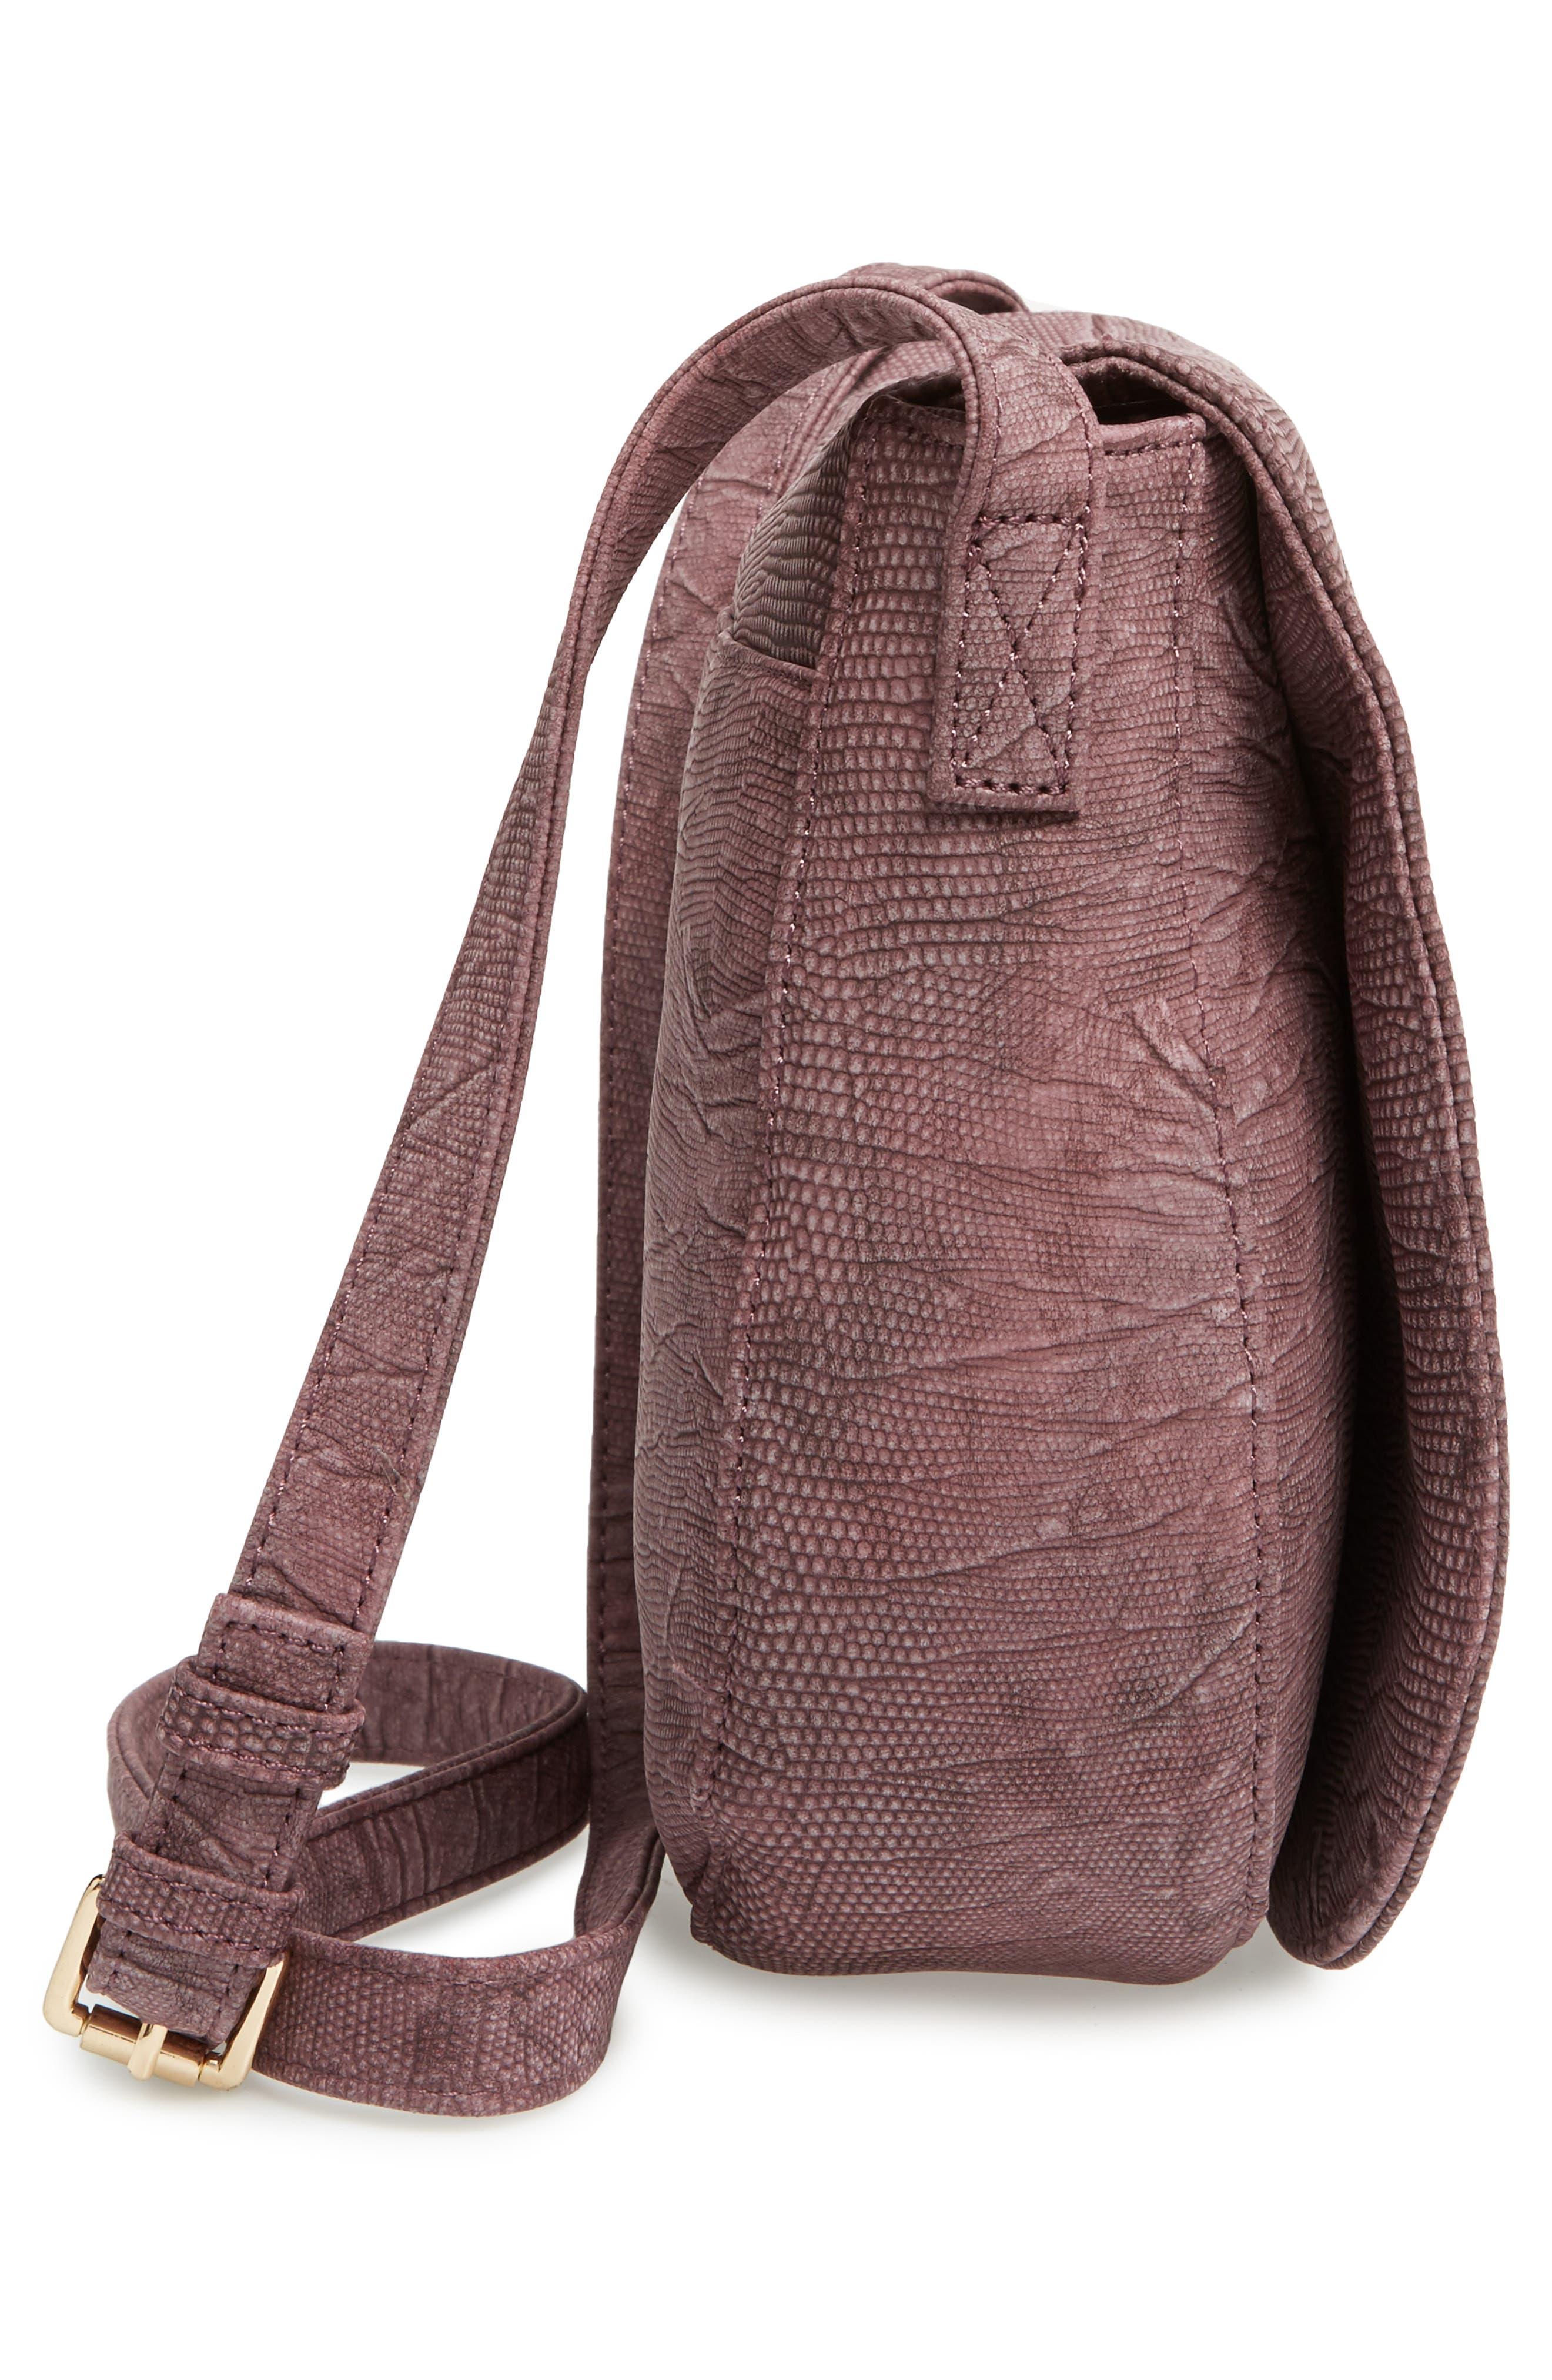 Livvy Faux Leather Crossbody Saddle Bag,                             Alternate thumbnail 5, color,                             Oxblood